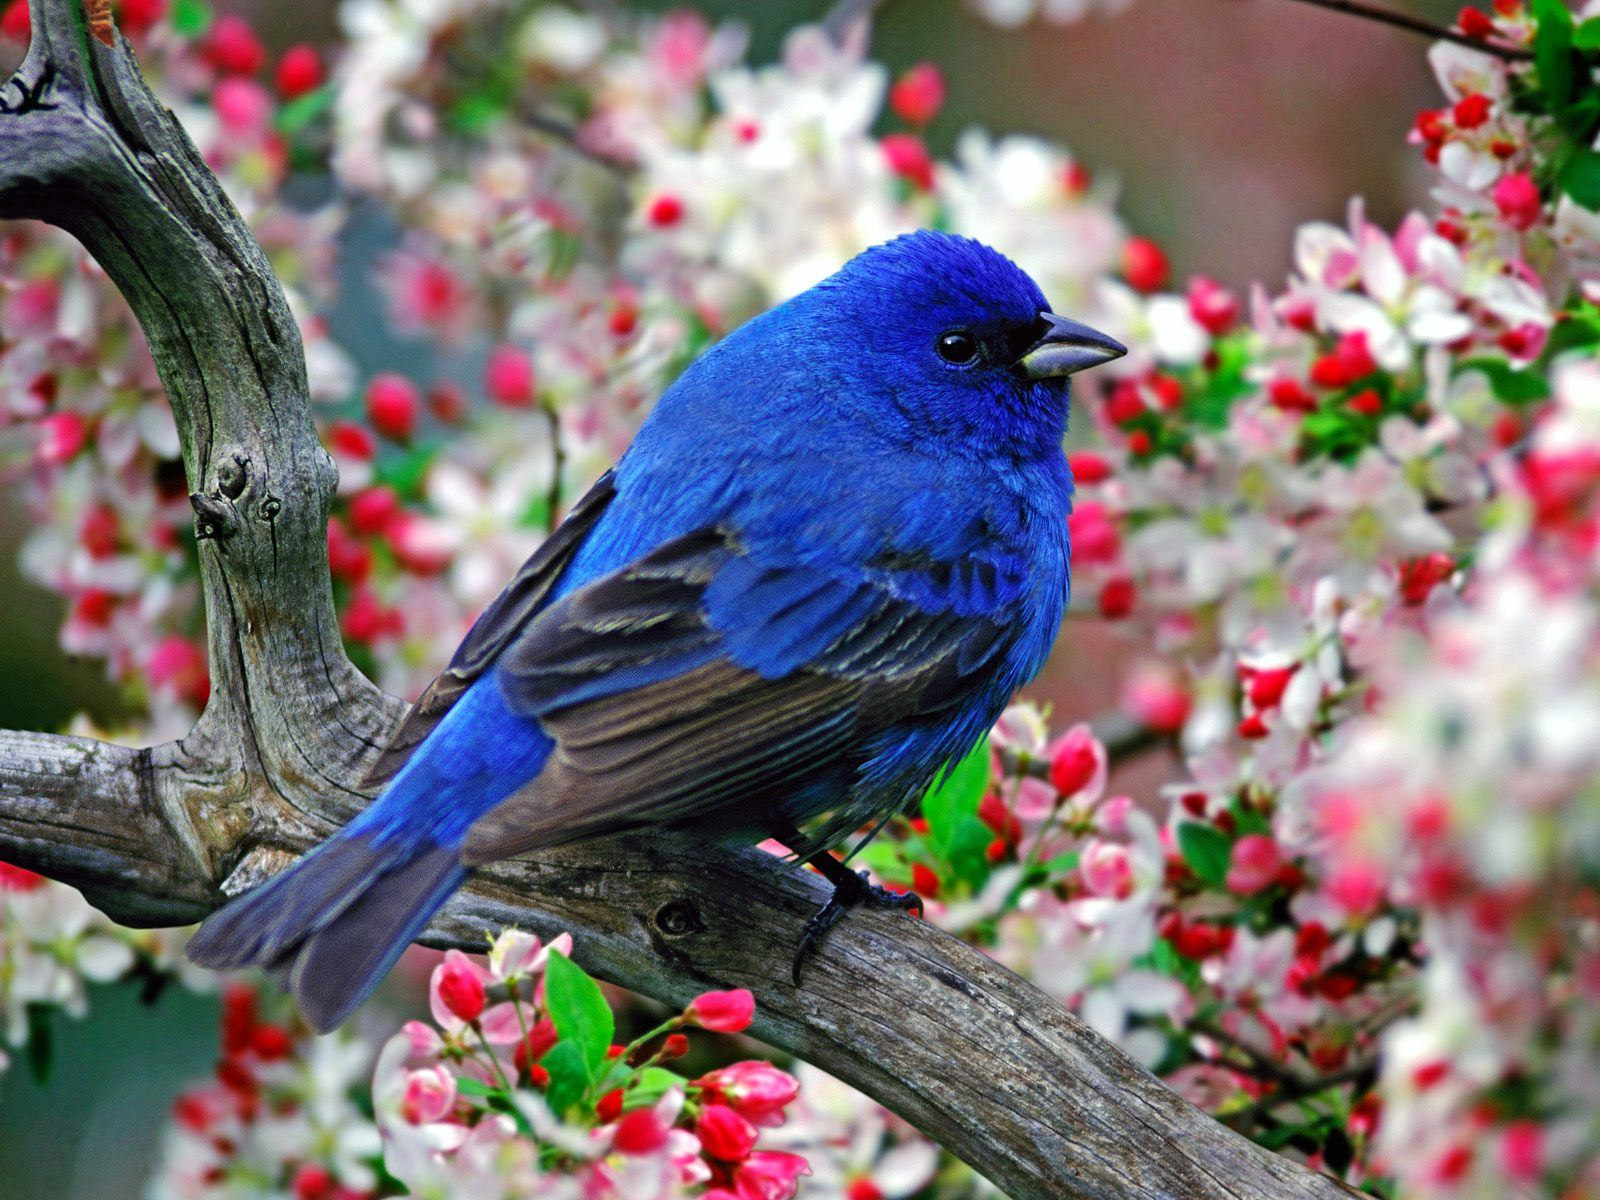 Blue Bird Pictures